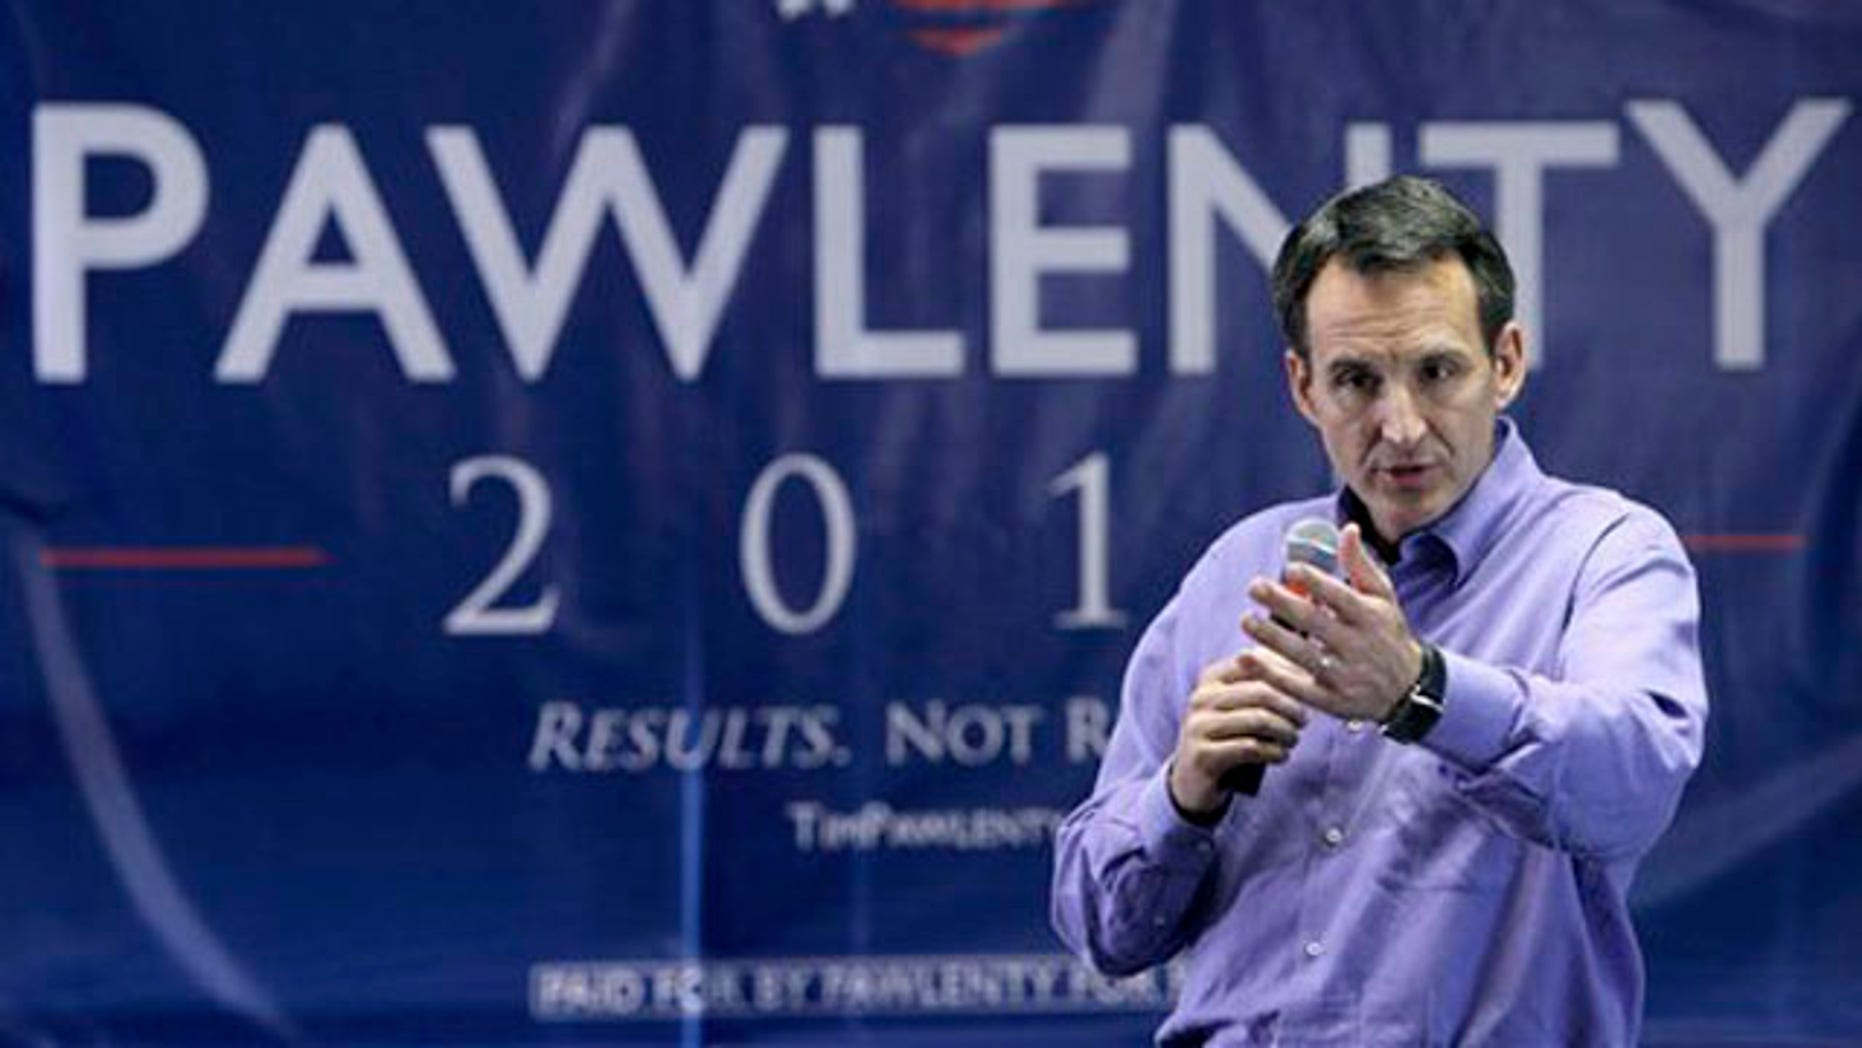 In this July 7 photo, Republican presidential candidate Tim Pawlenty speaks in Urbandale, Iowa.